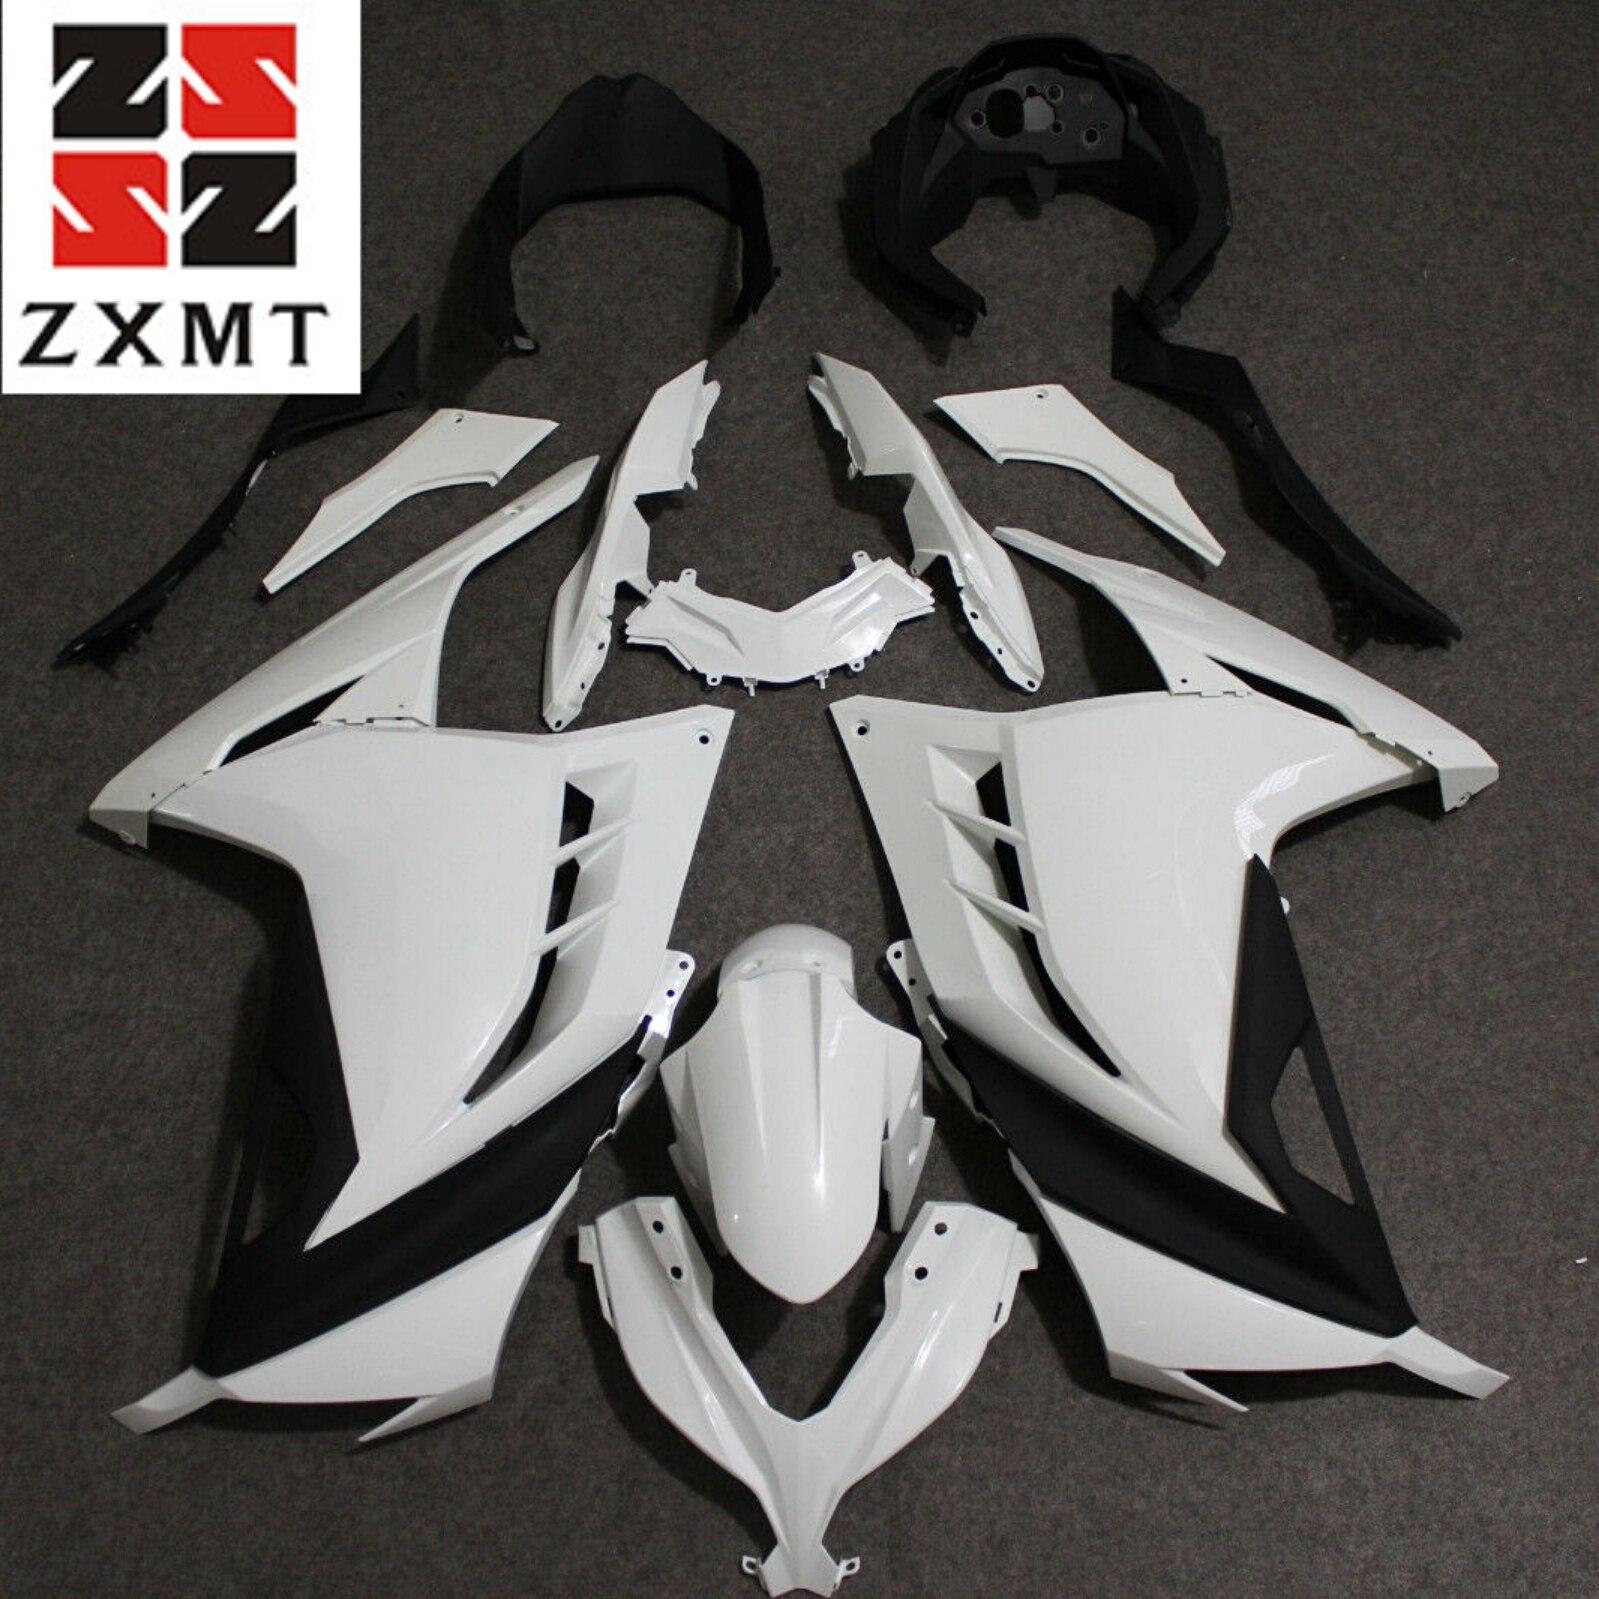 NT FAIRING Fit for Kawasaki Ninja 2013-2017 EX300 300R Injection Mold Fairing Kit Unpainted Bodywork Plastic Bodyframe 2014 2015 2016 13 14 15 16 17